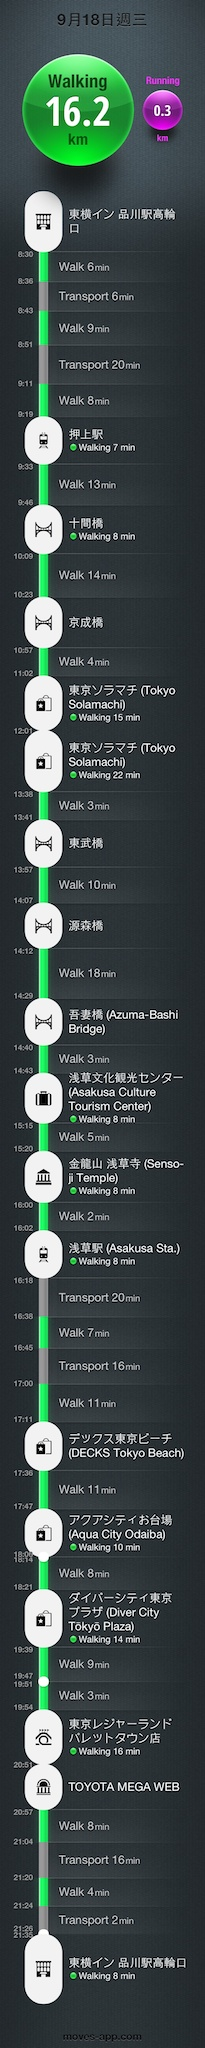 Moves 路徑列表